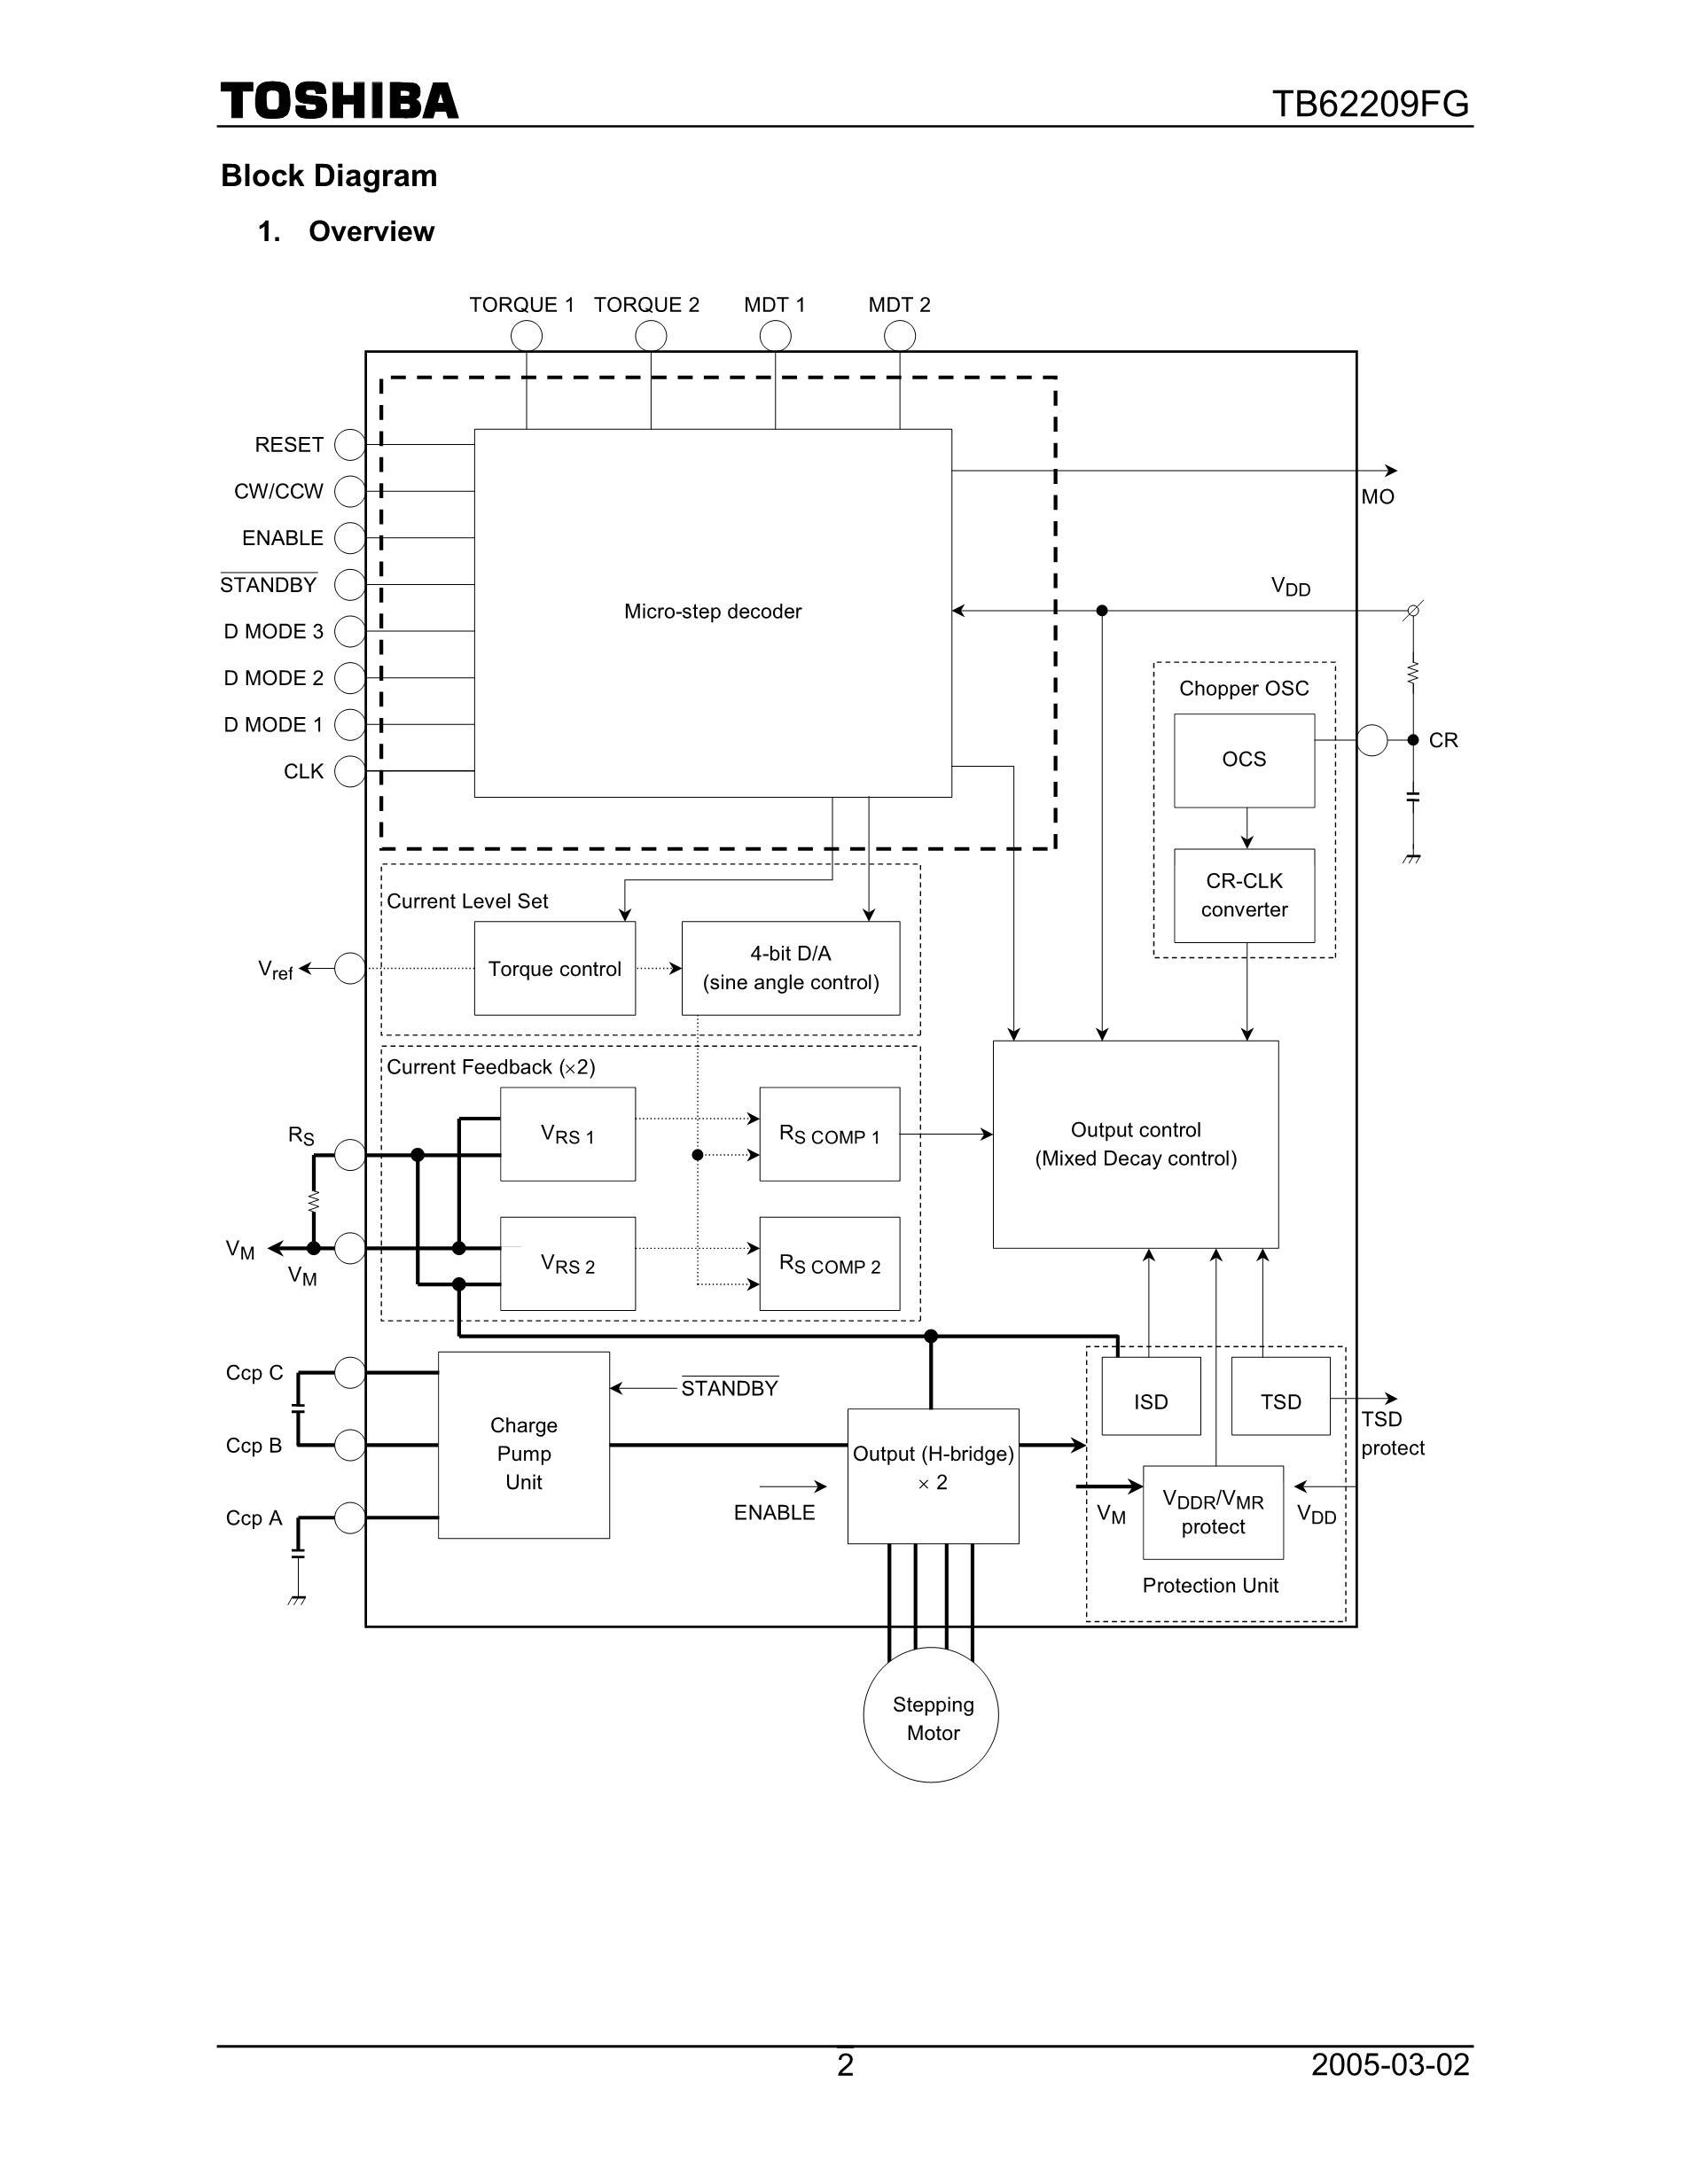 TB62214AFTG(O,8,EL's pdf picture 2